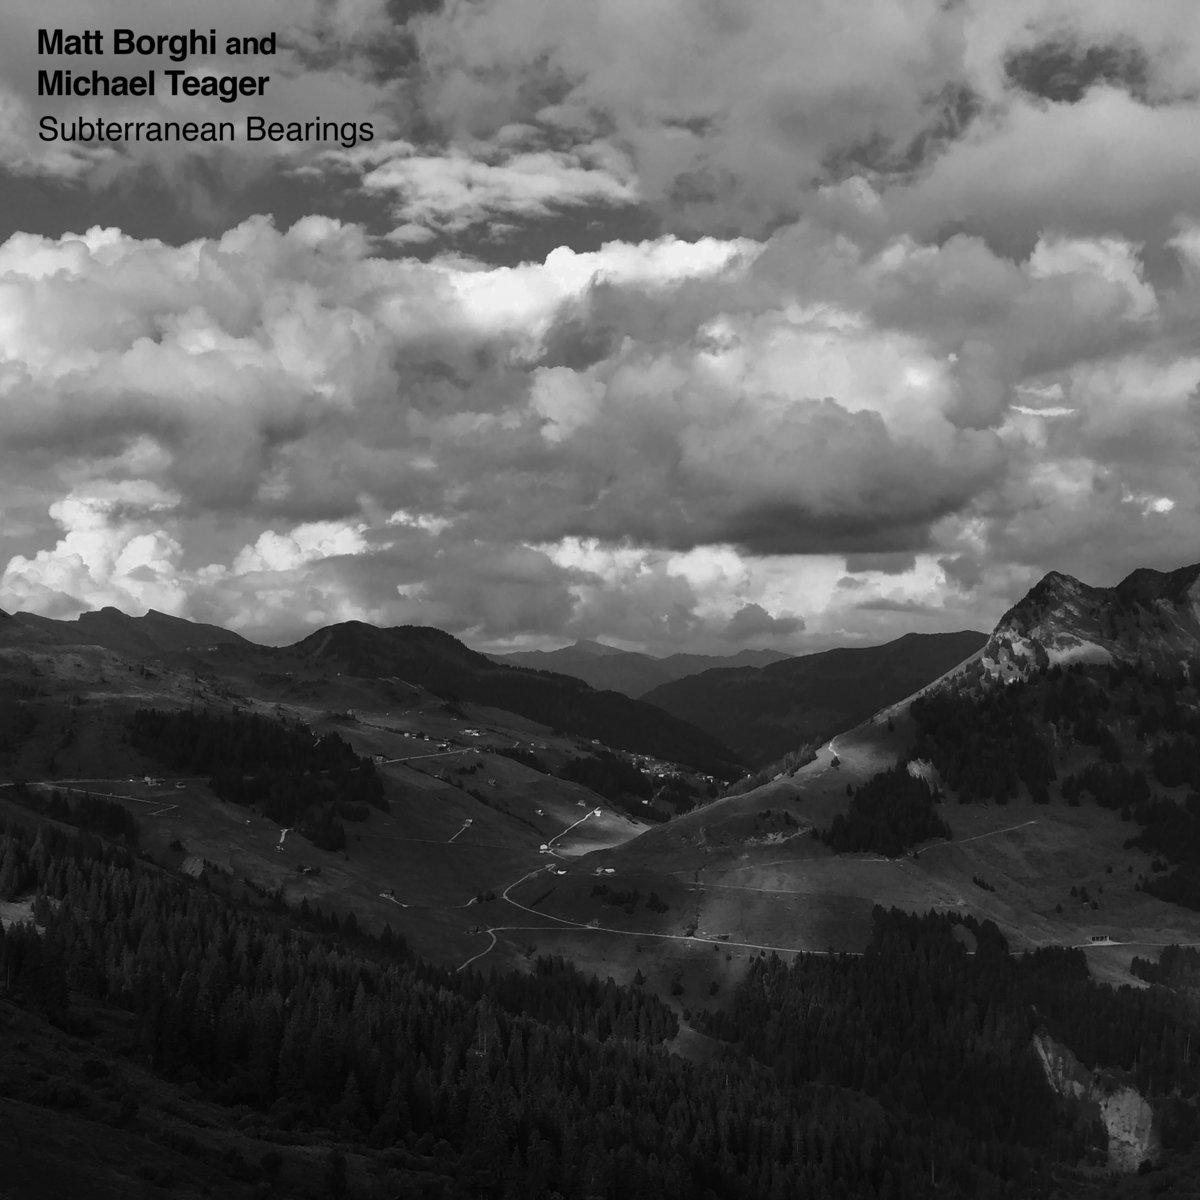 Subterranean Bearings | Matt Borghi